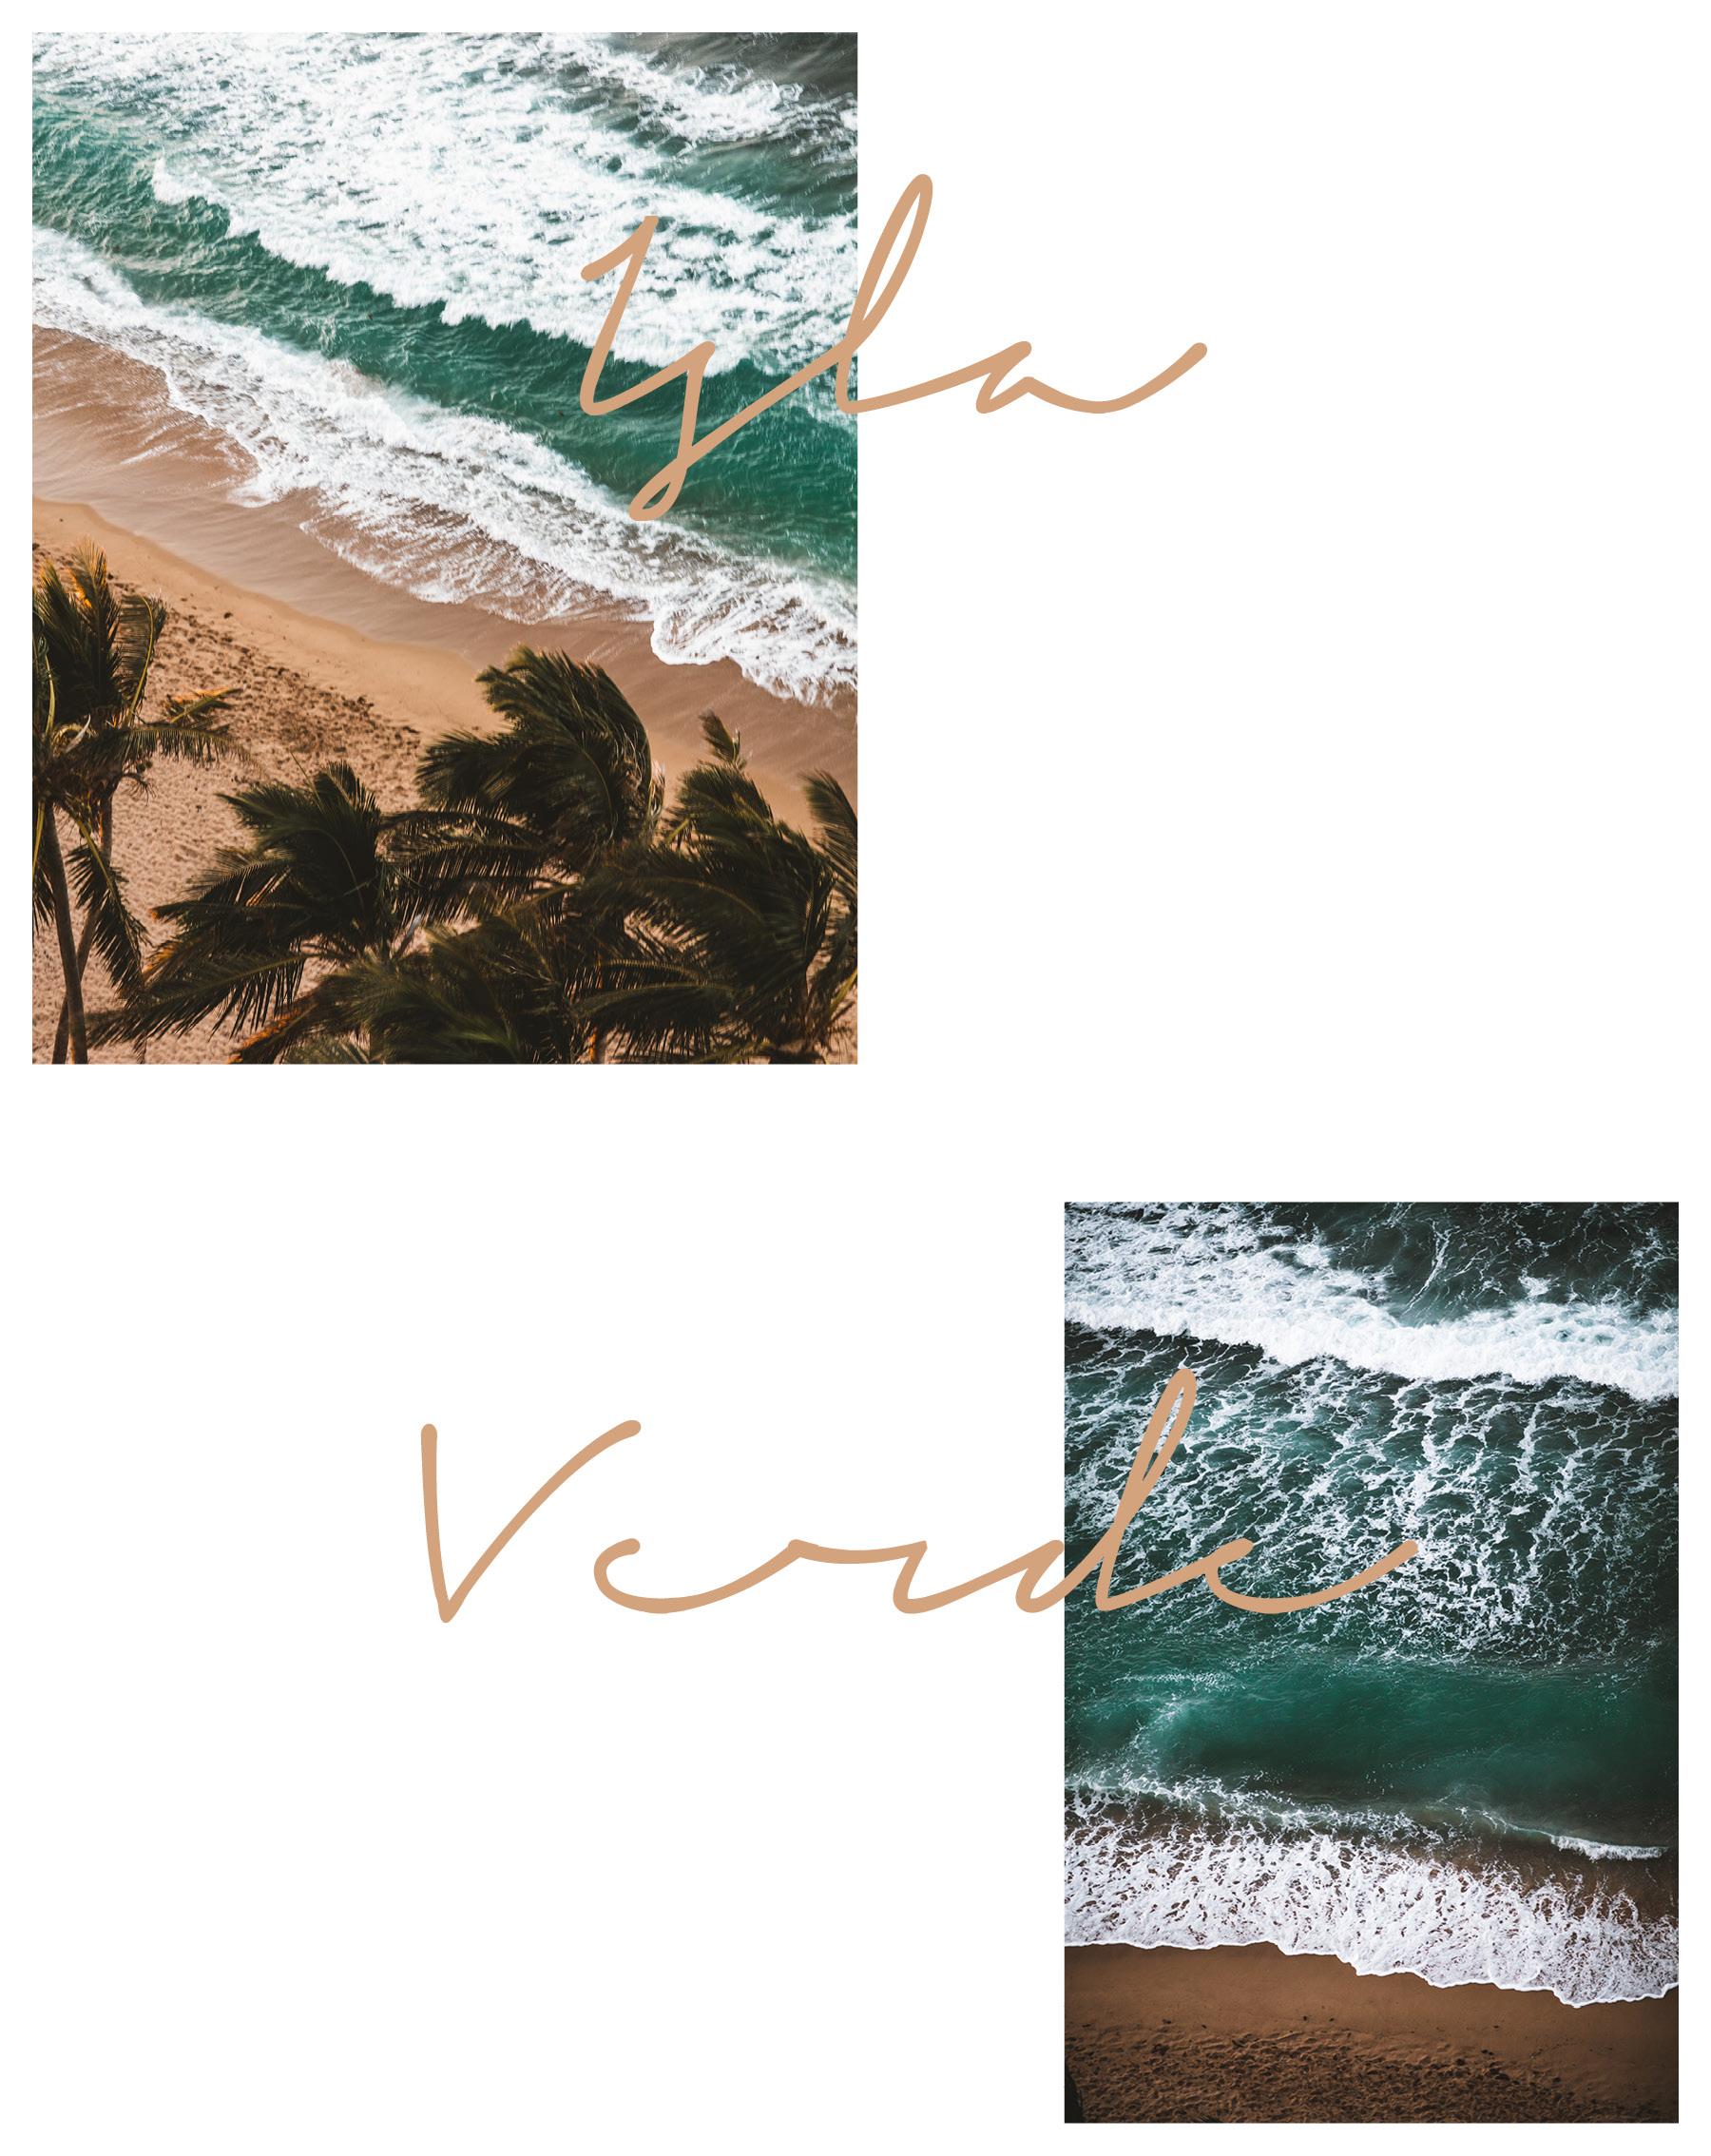 Isla Verde_3.jpg